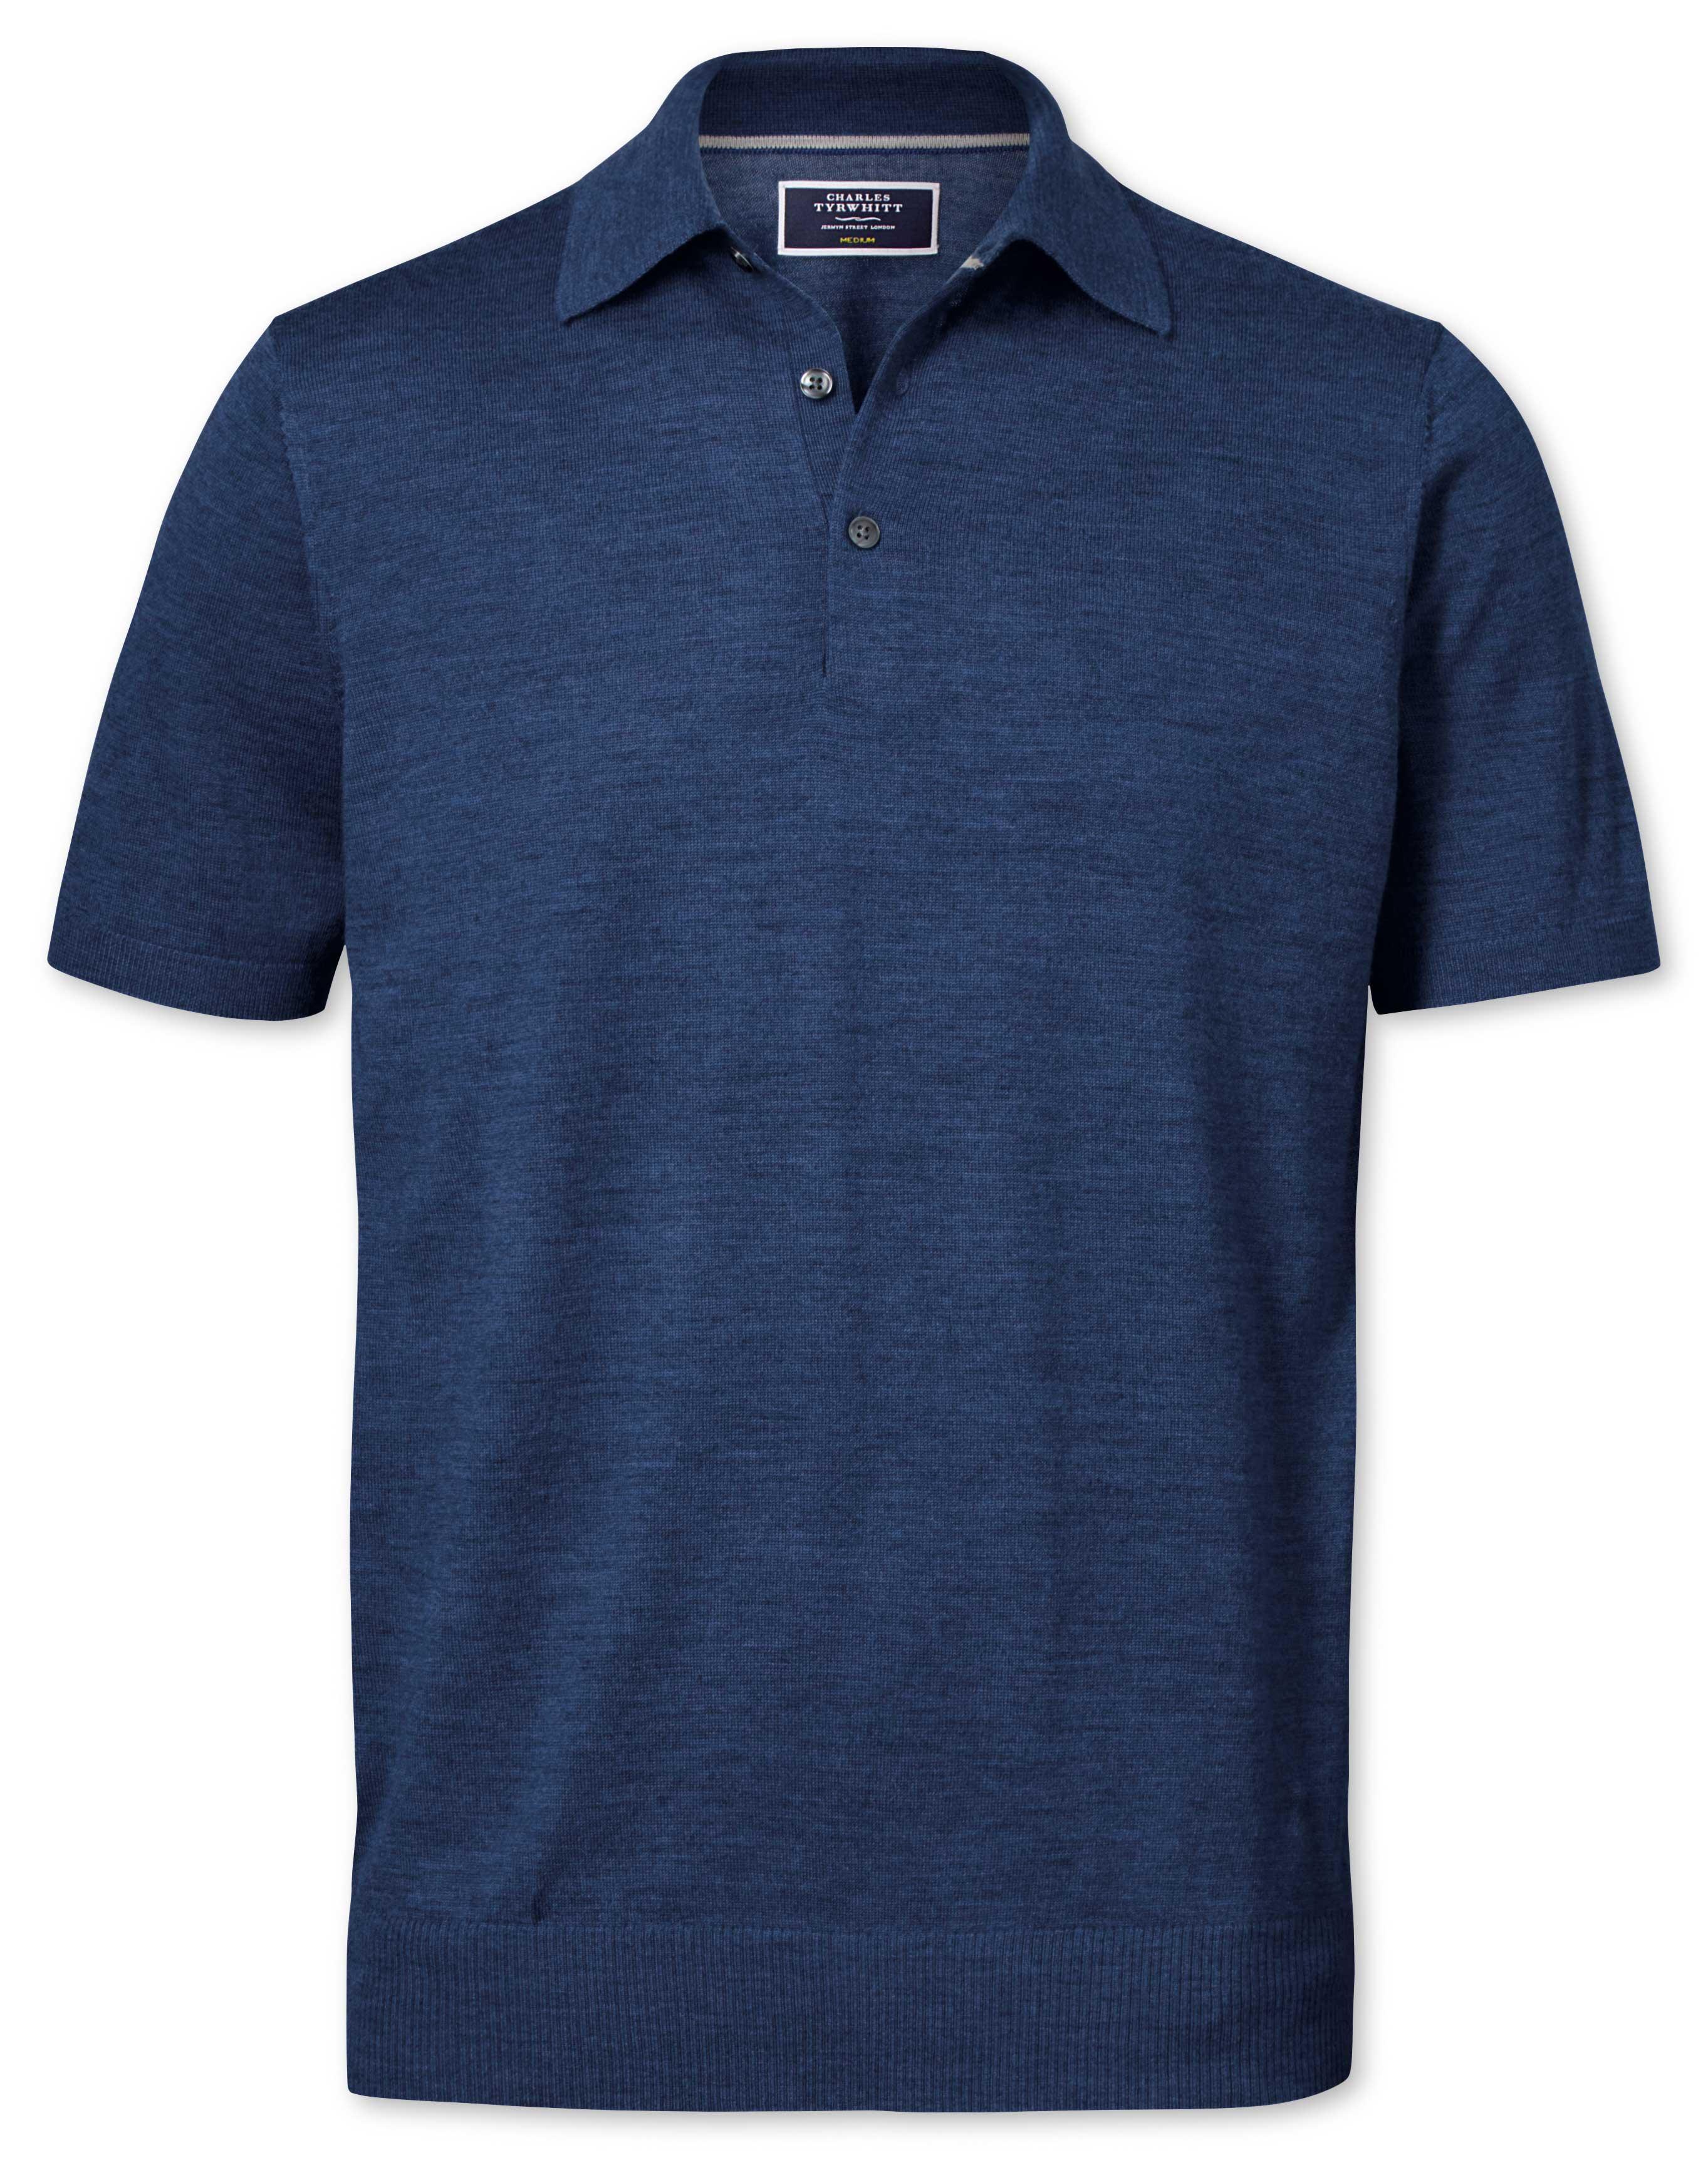 Mid Blue Merino Wool Polo Collar Short Sleeve Jumper Size XXXL by Charles Tyrwhitt